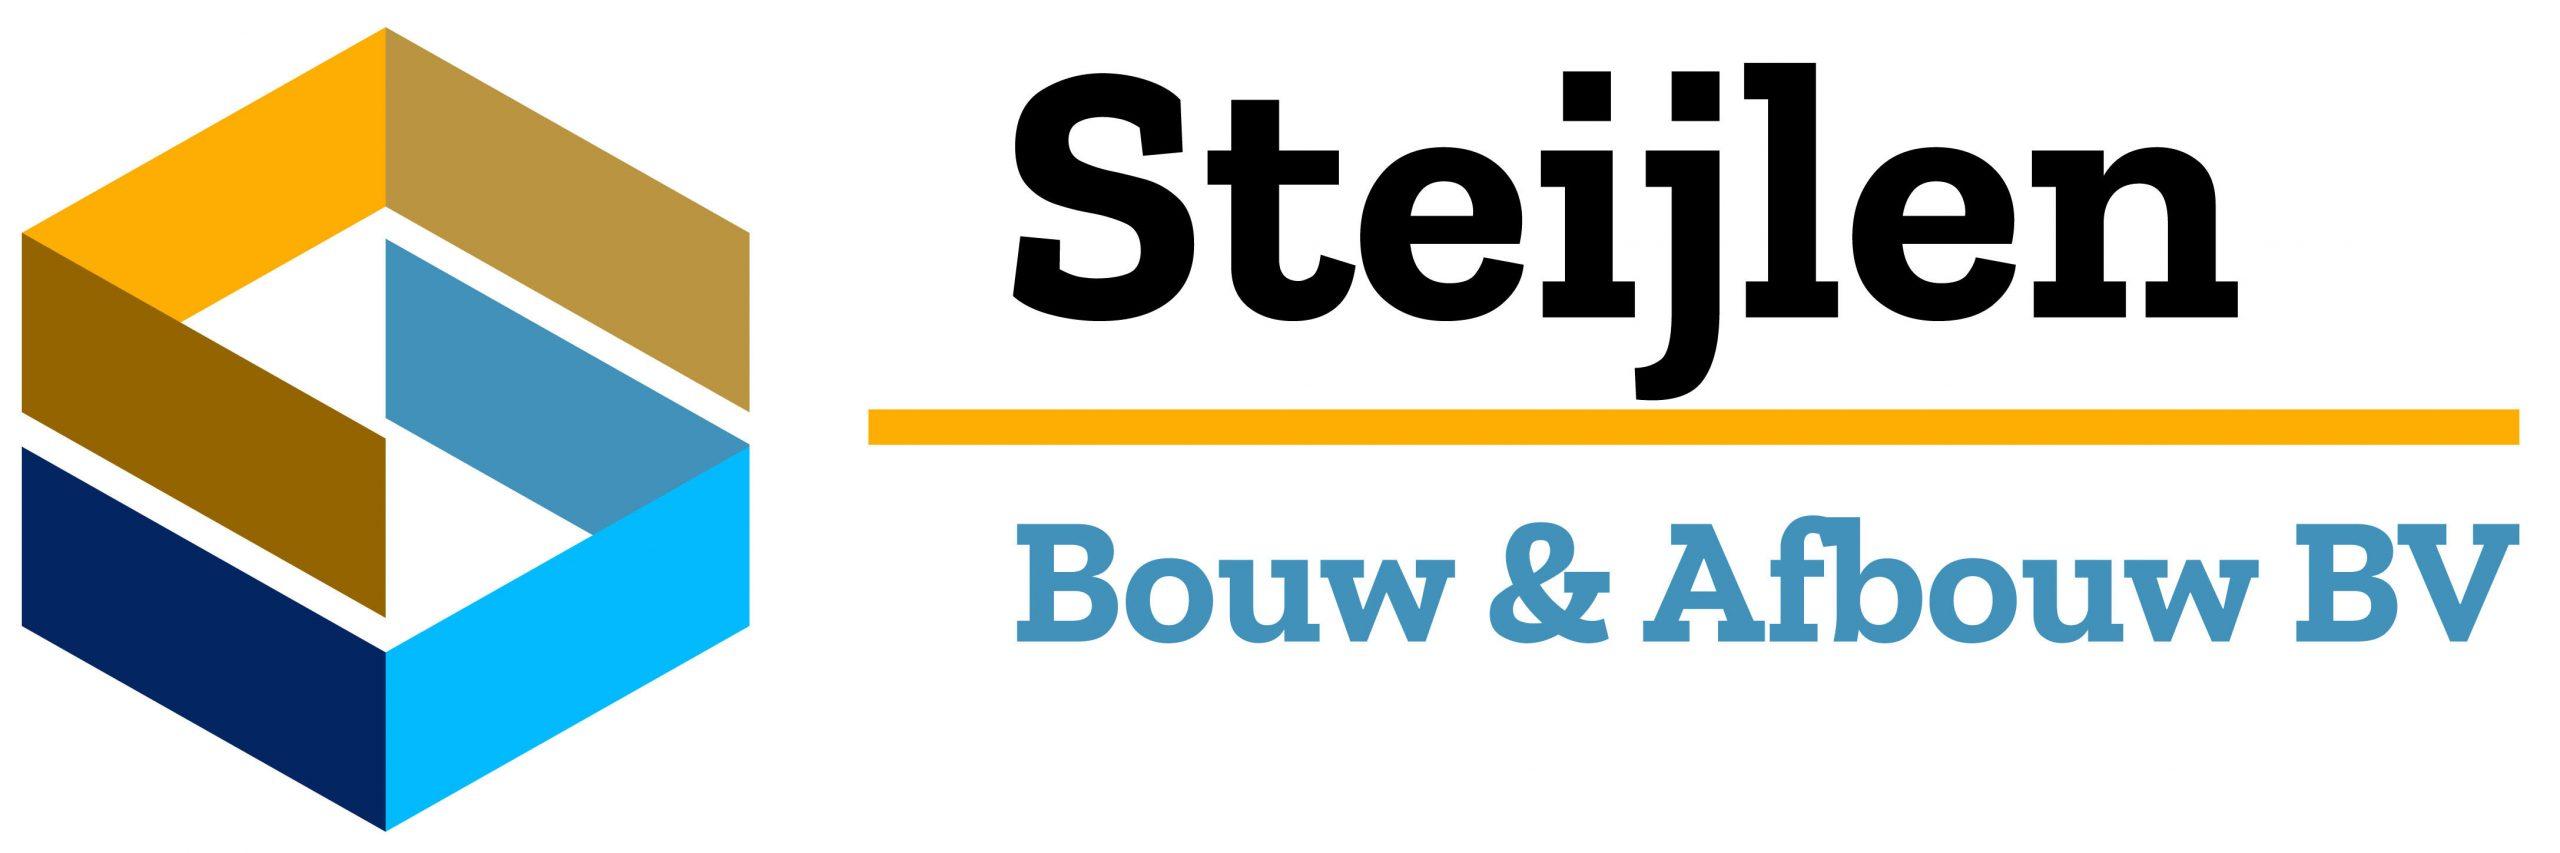 Steijlen Bouw & Afbouw